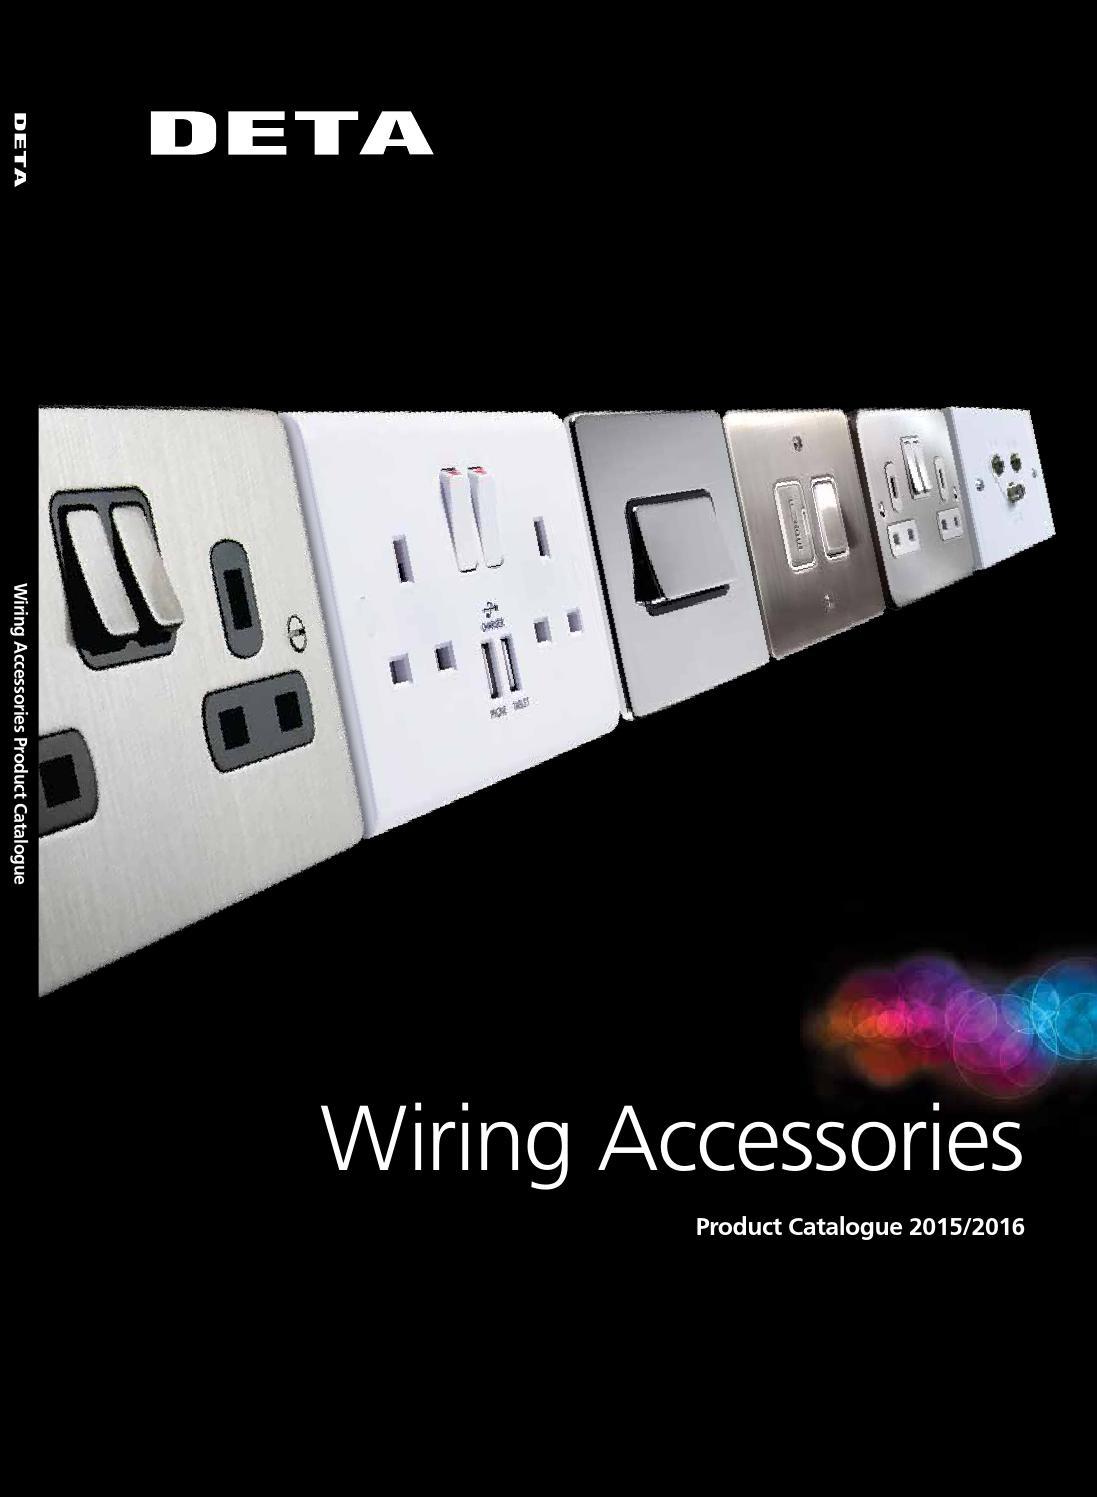 Deta Wiring Accessories Product Catalogue By Sentor Electrical Issuu Mk Rj45 Socket Diagram